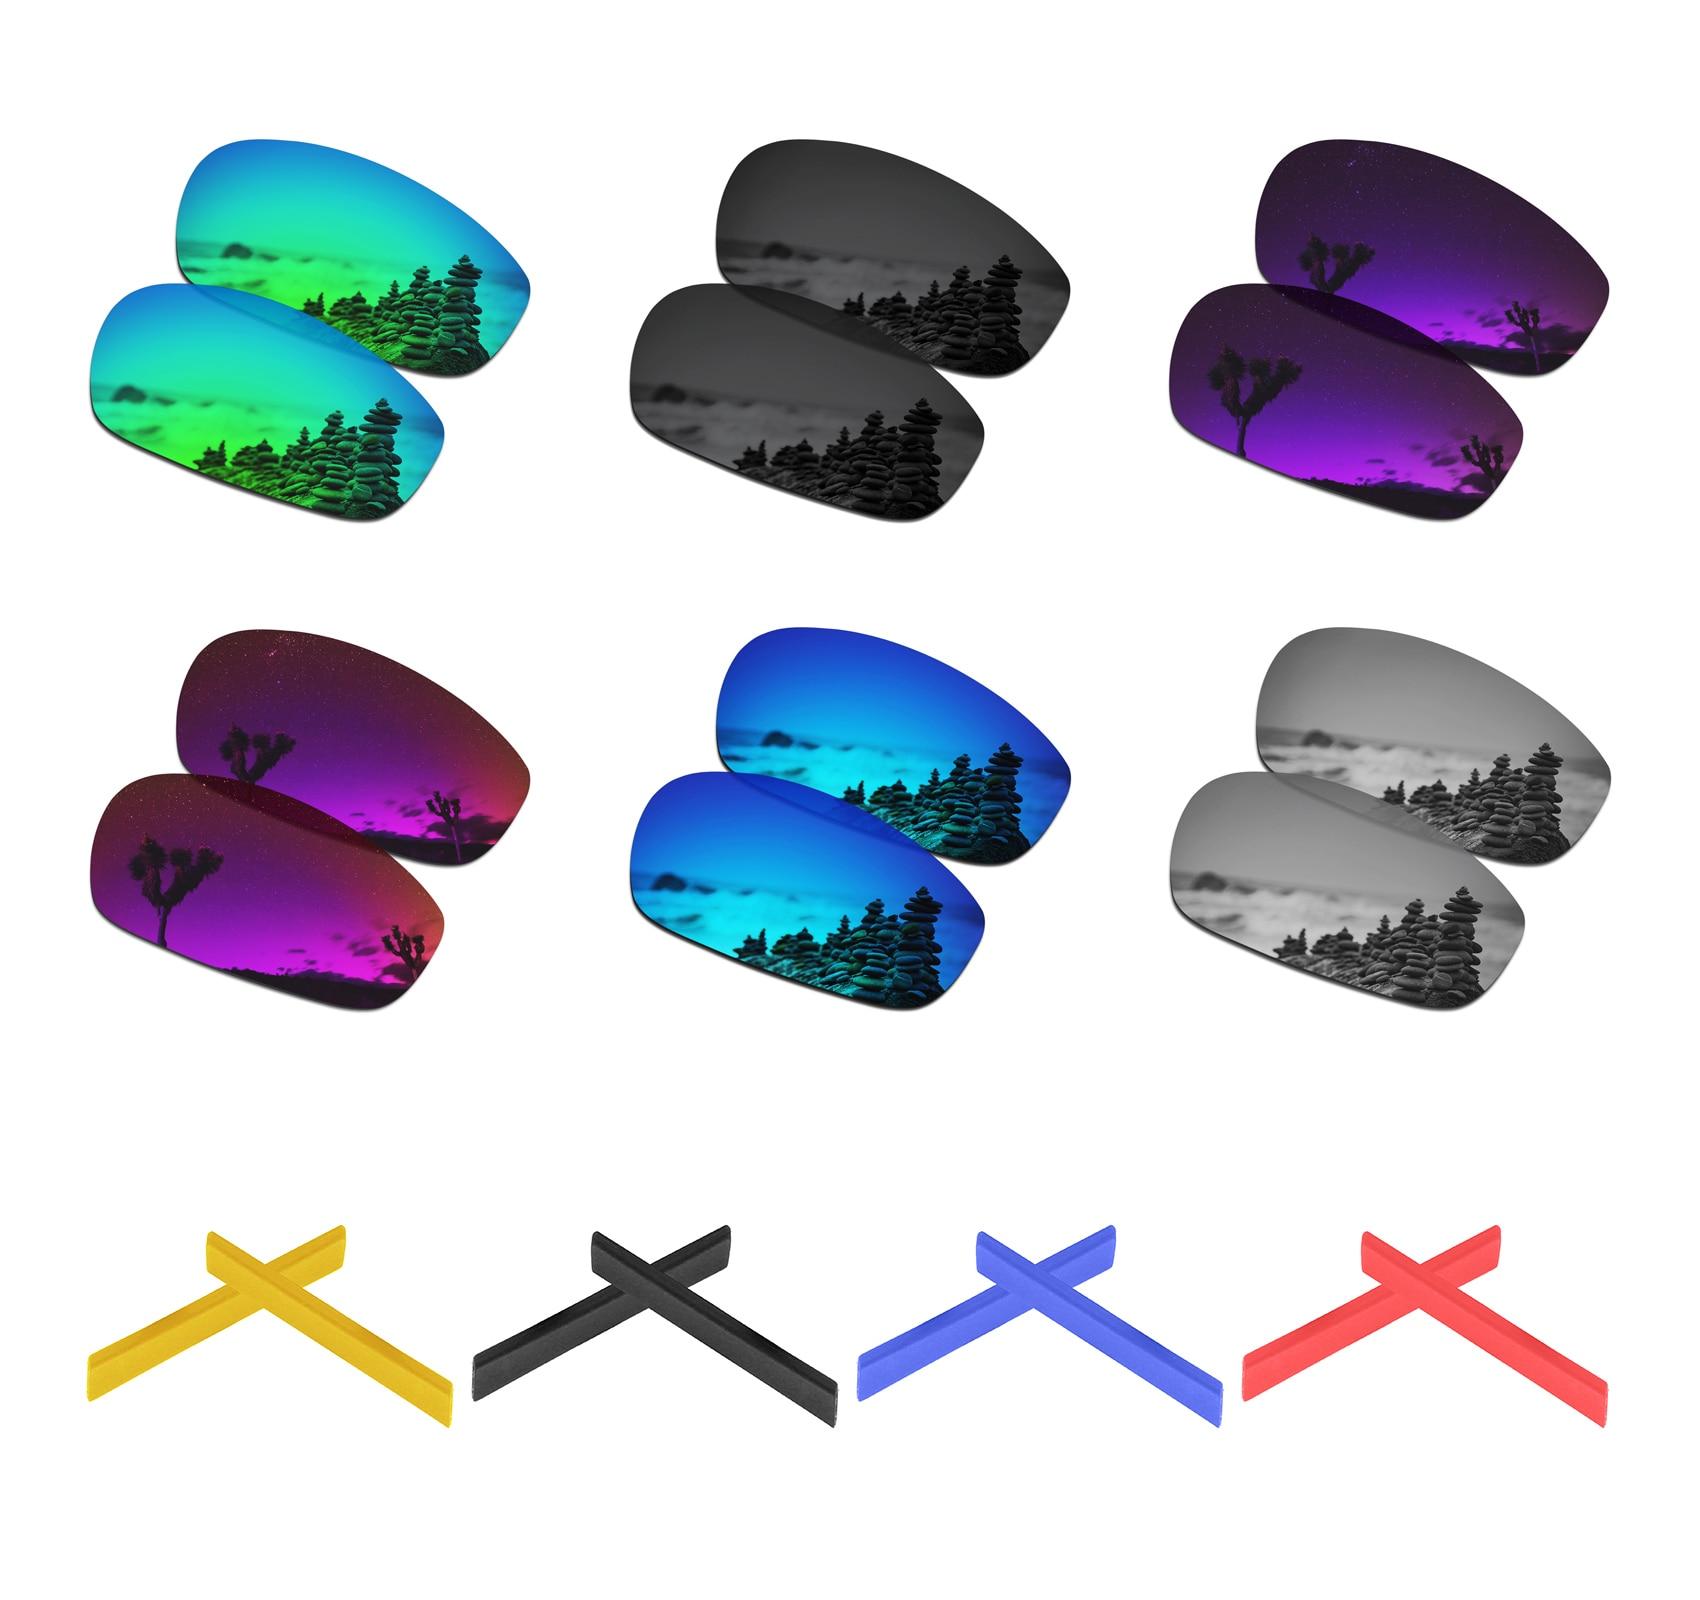 SmartVLT Polarized Replacement Lenses For Oakley Split Jacket Sunglasses - Multiple Options